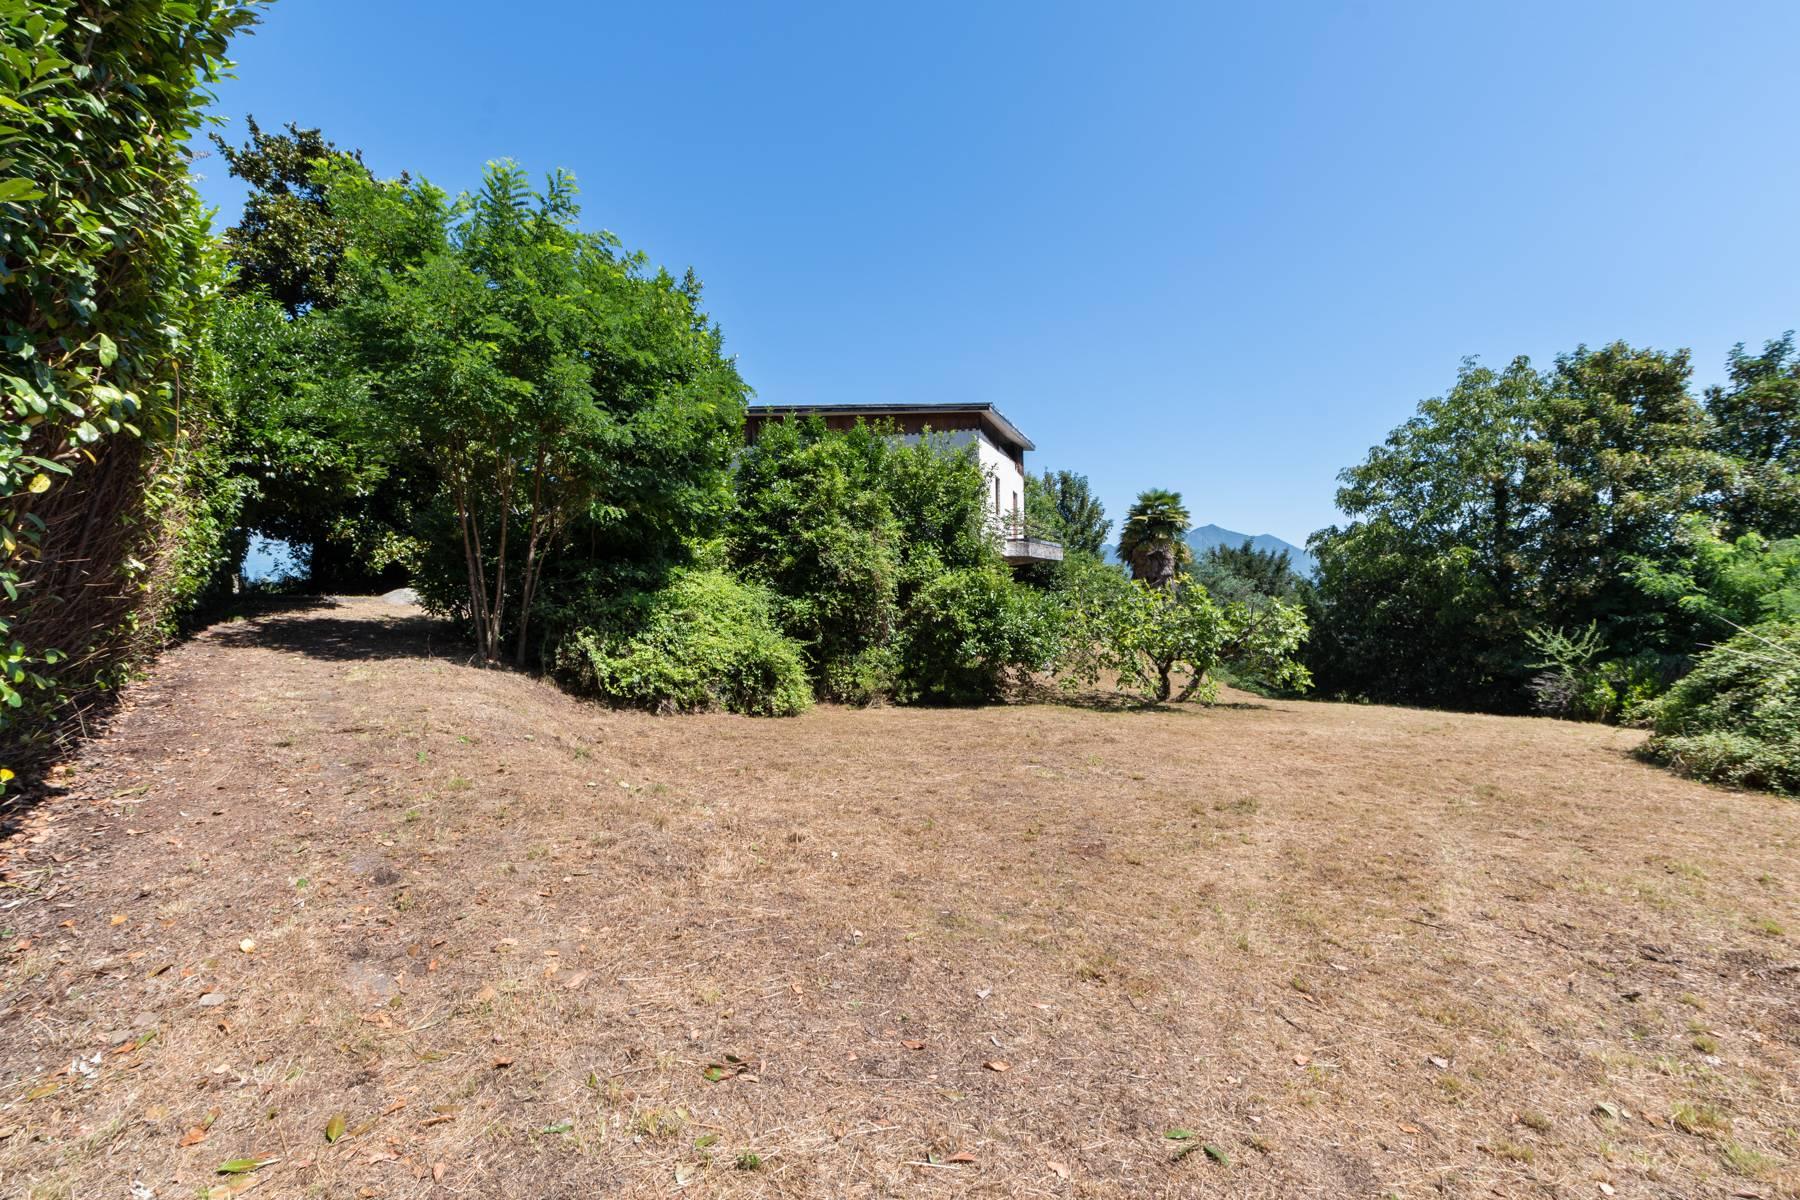 Villa in Vendita a Stresa: 5 locali, 150 mq - Foto 25